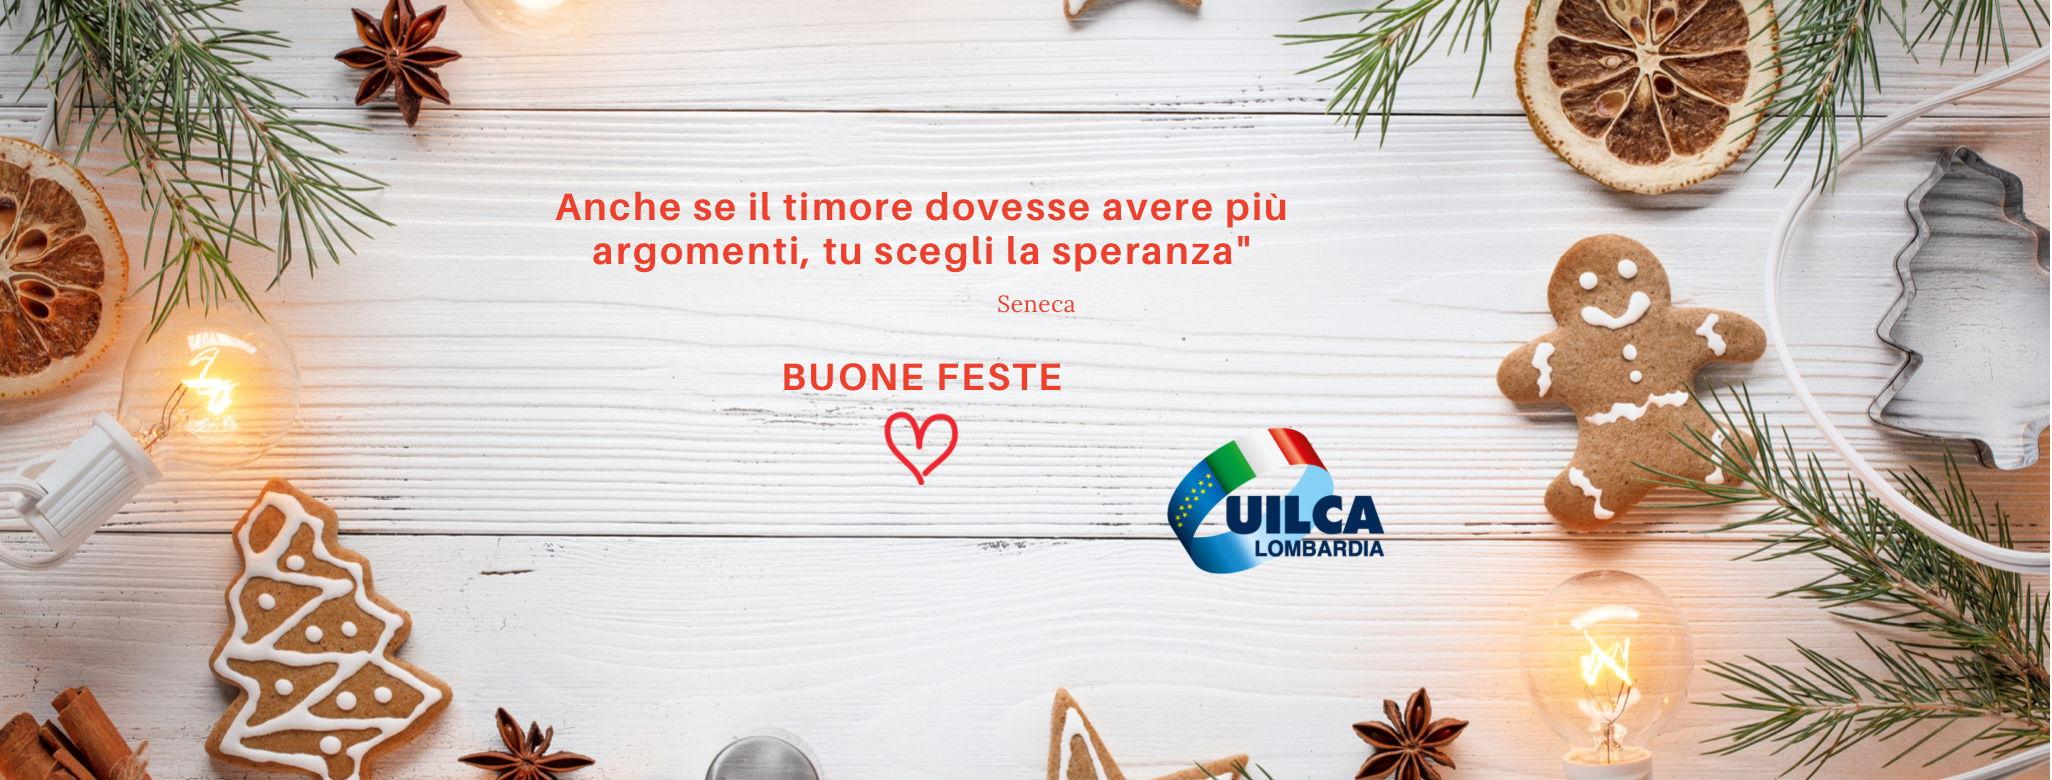 buone_feste_uilca_lombardia